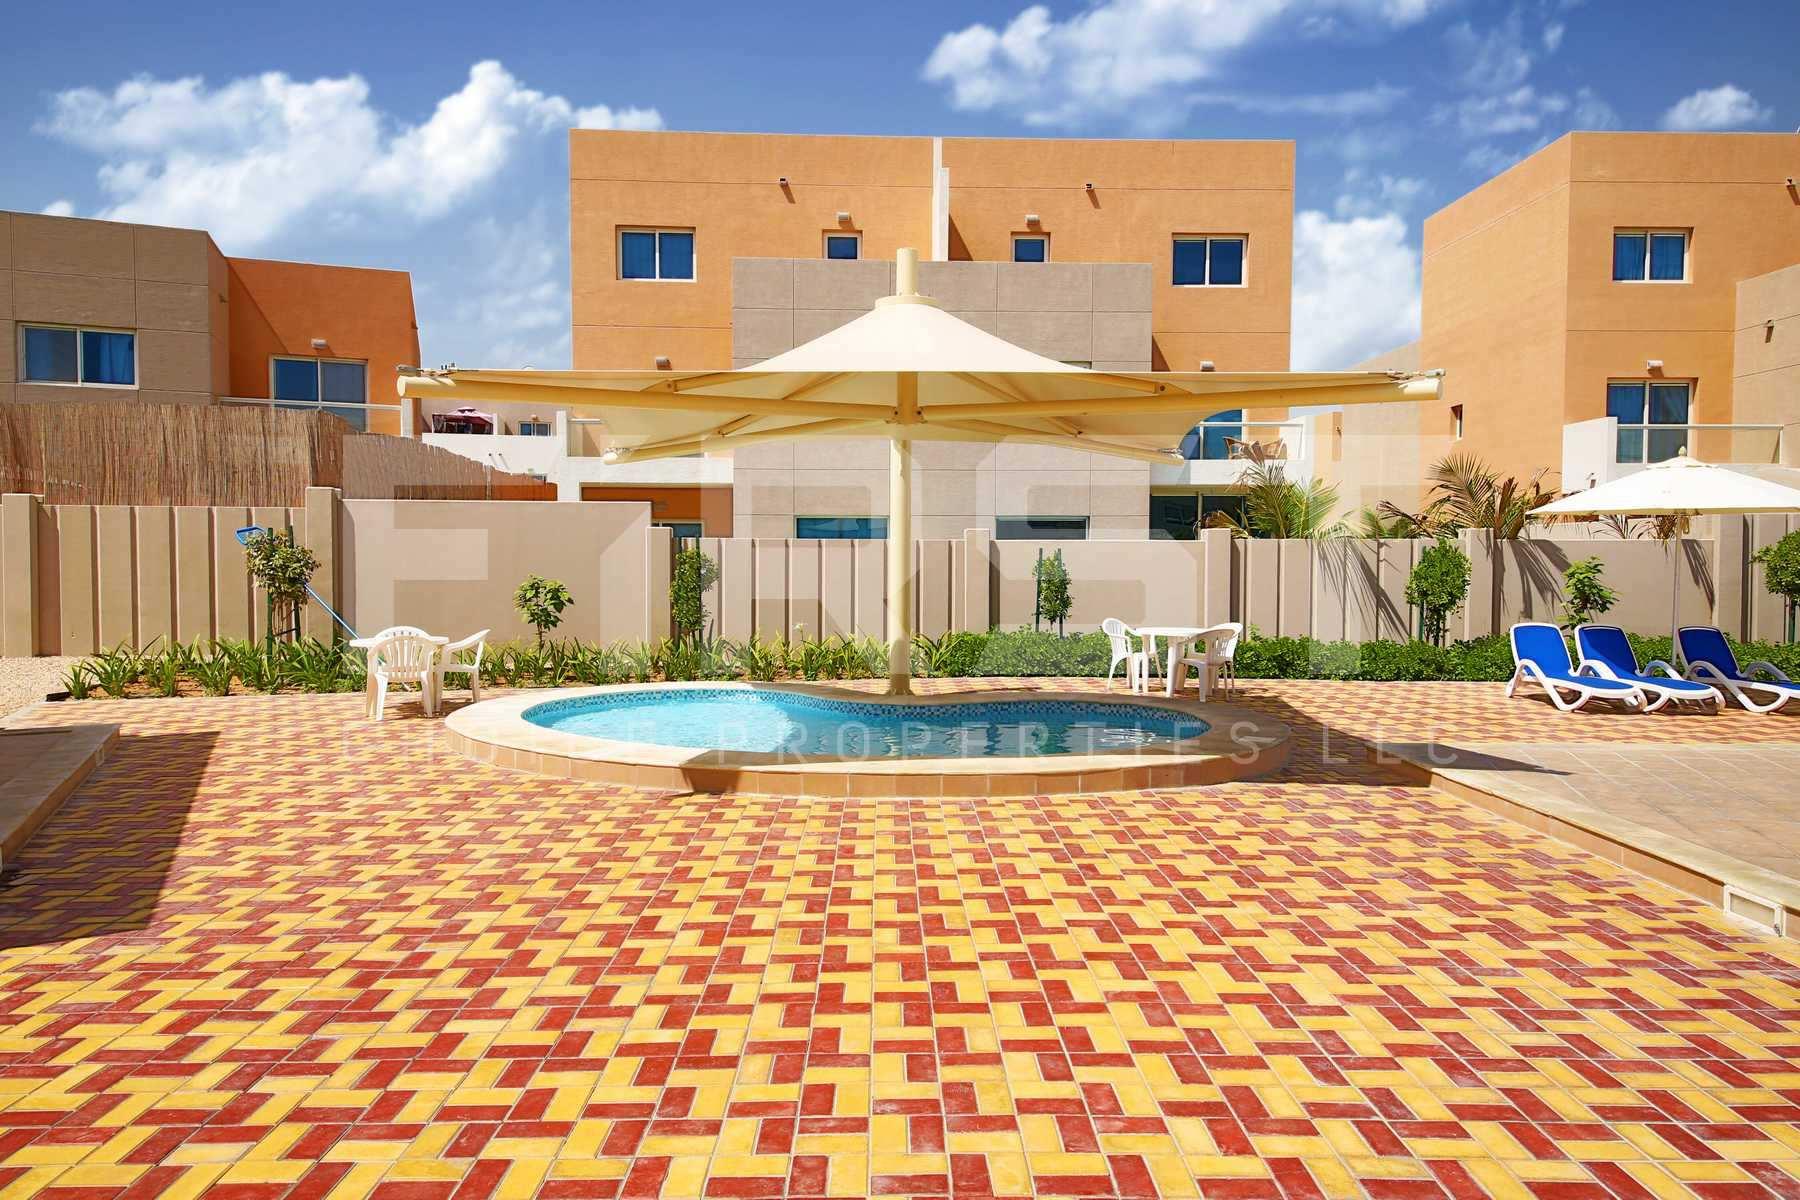 External Photo of Contemporary Village Al Reef Villas Al Reef Abu Dhabi UAE (2).jpg